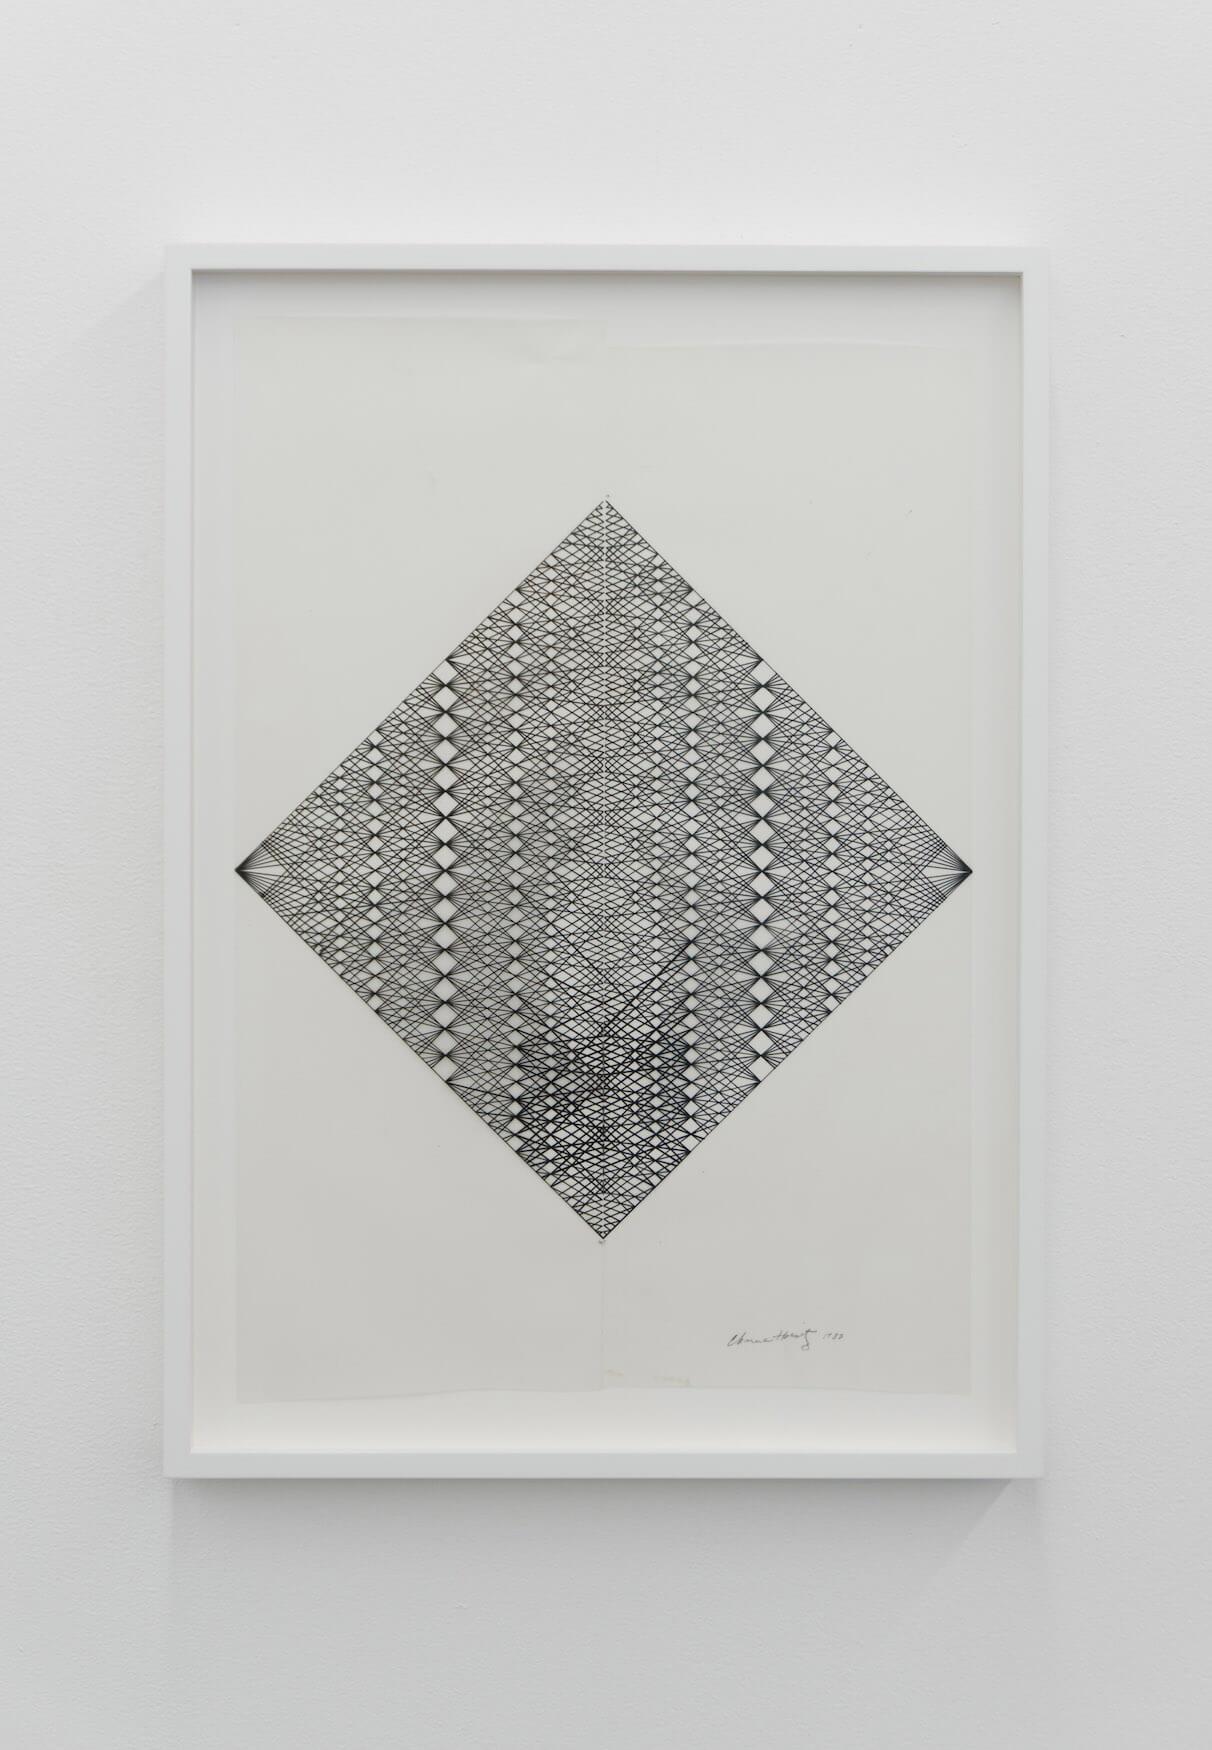 Horwitz, Canon Diamond - Two Halves, 1982 (CH 82.018) (#1044)